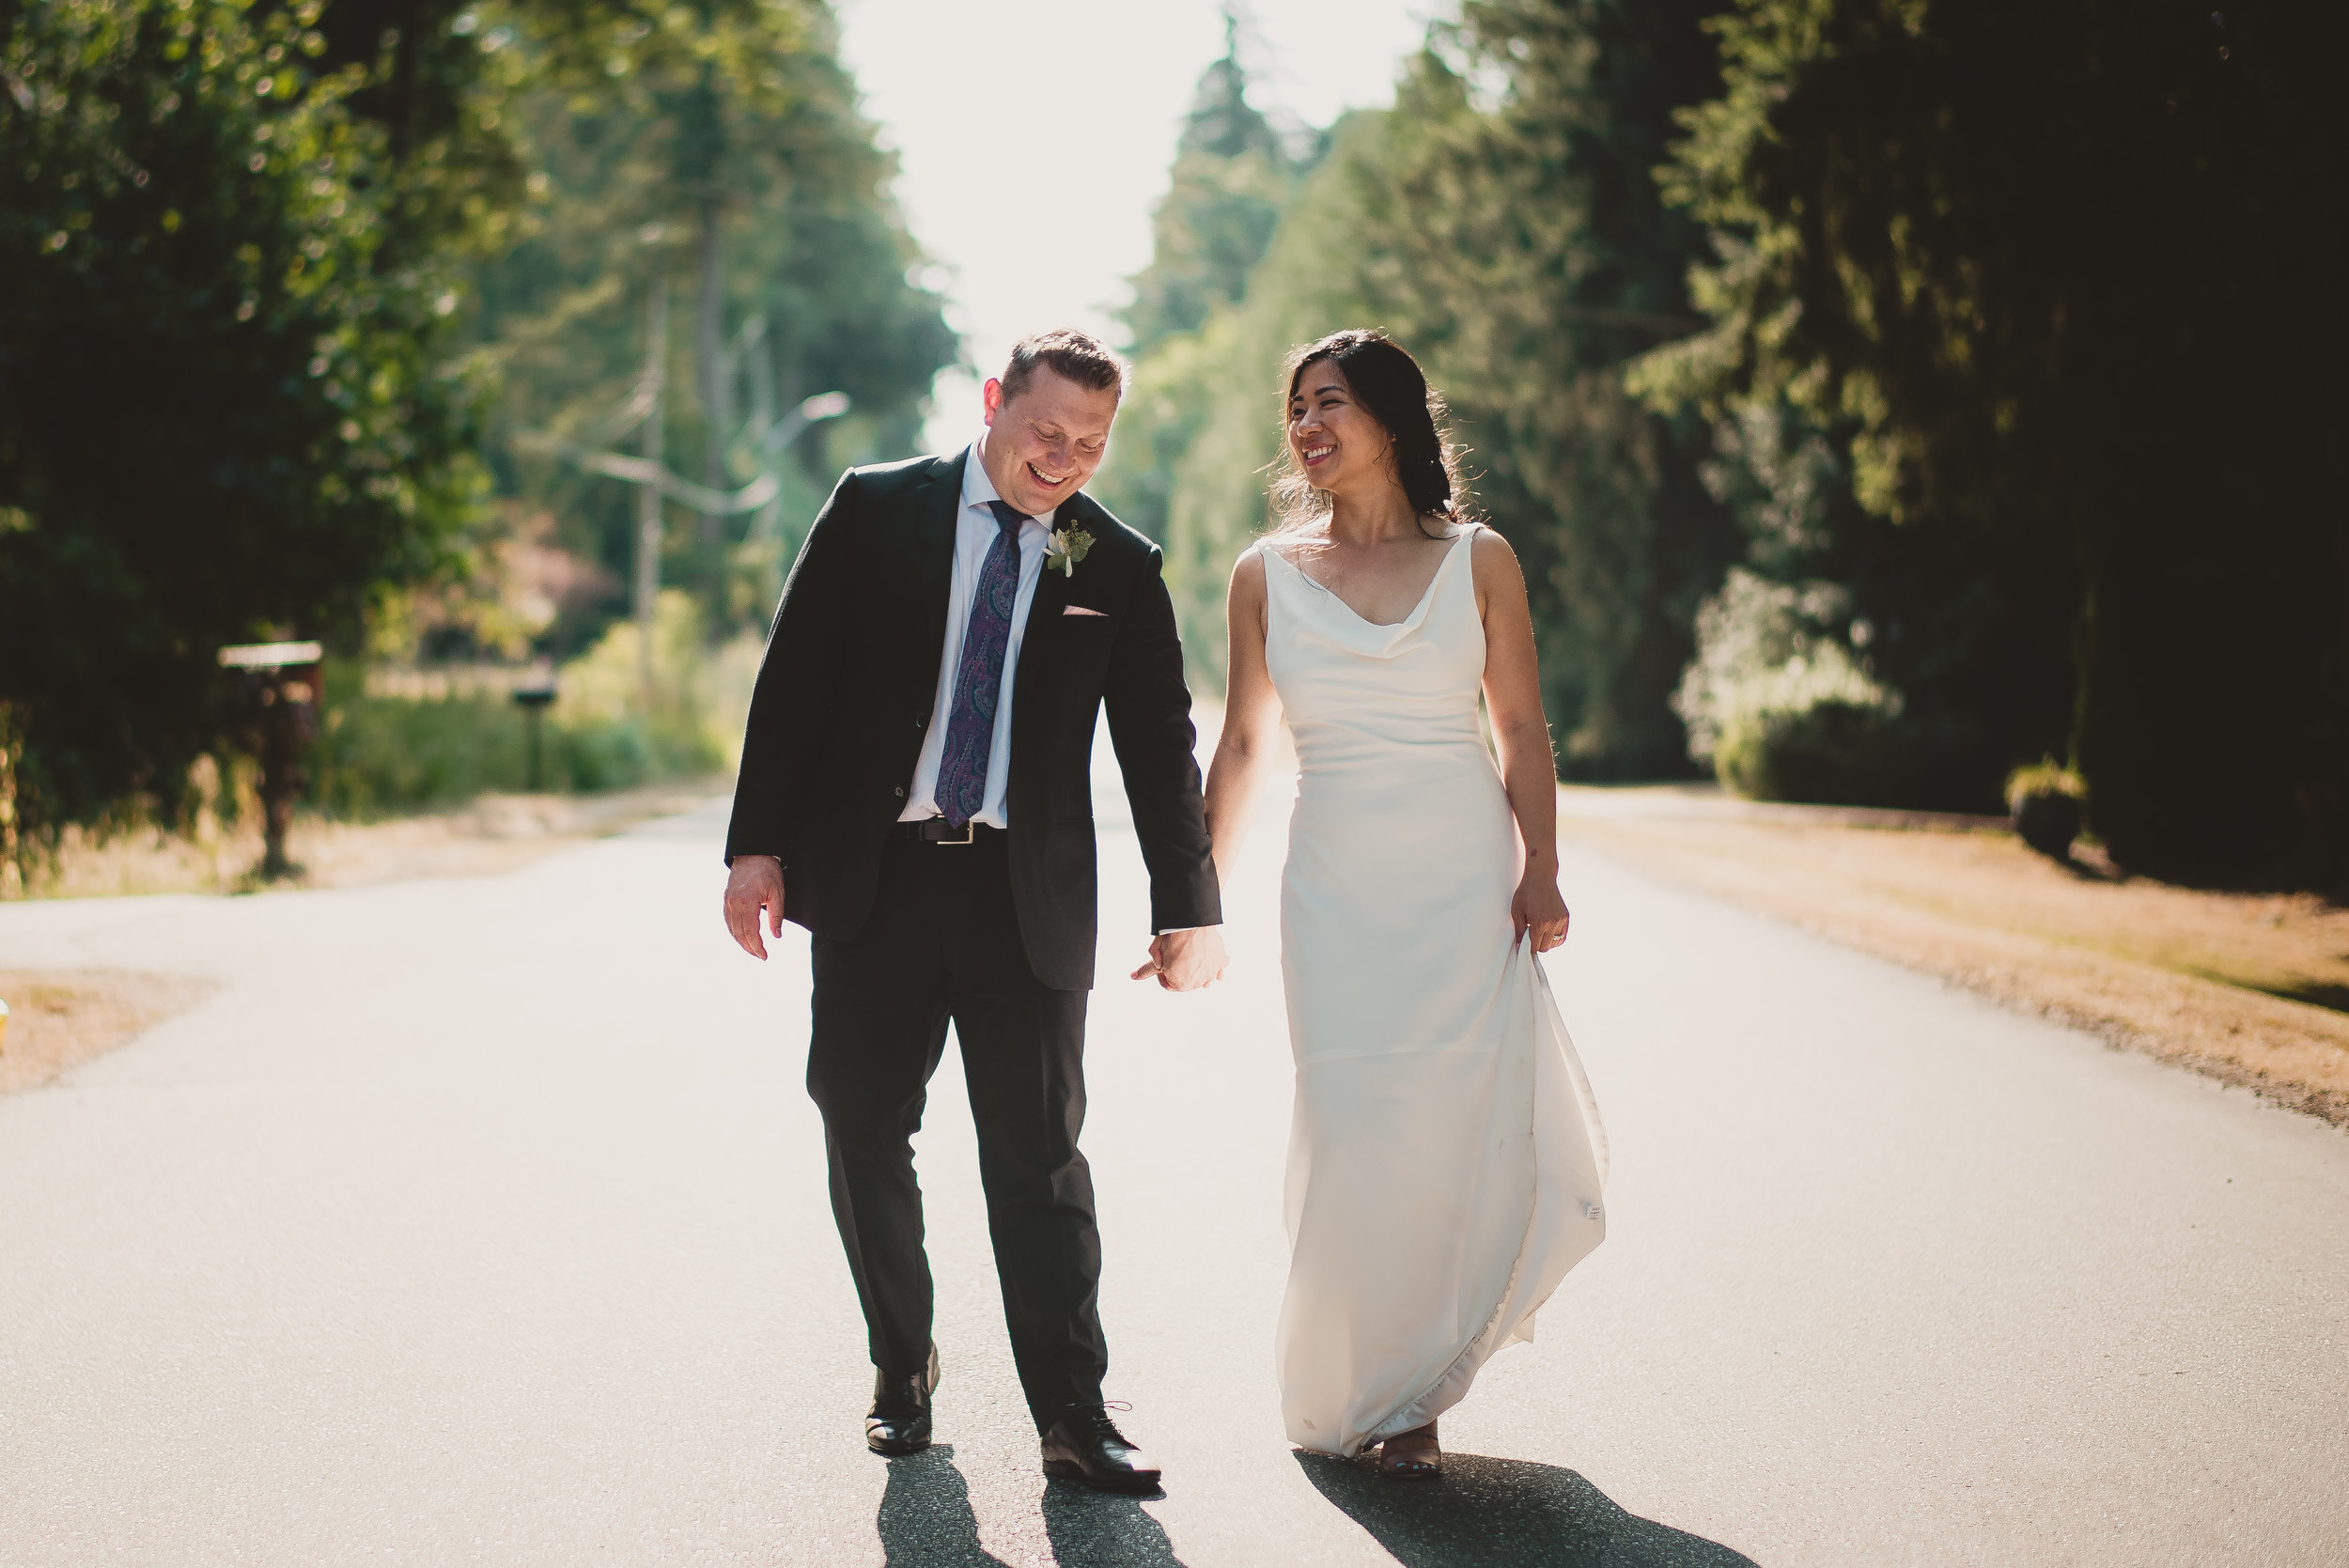 Derrick & Sophie - Wedding - Moriah Jae Photography  (612 of 977).jpg